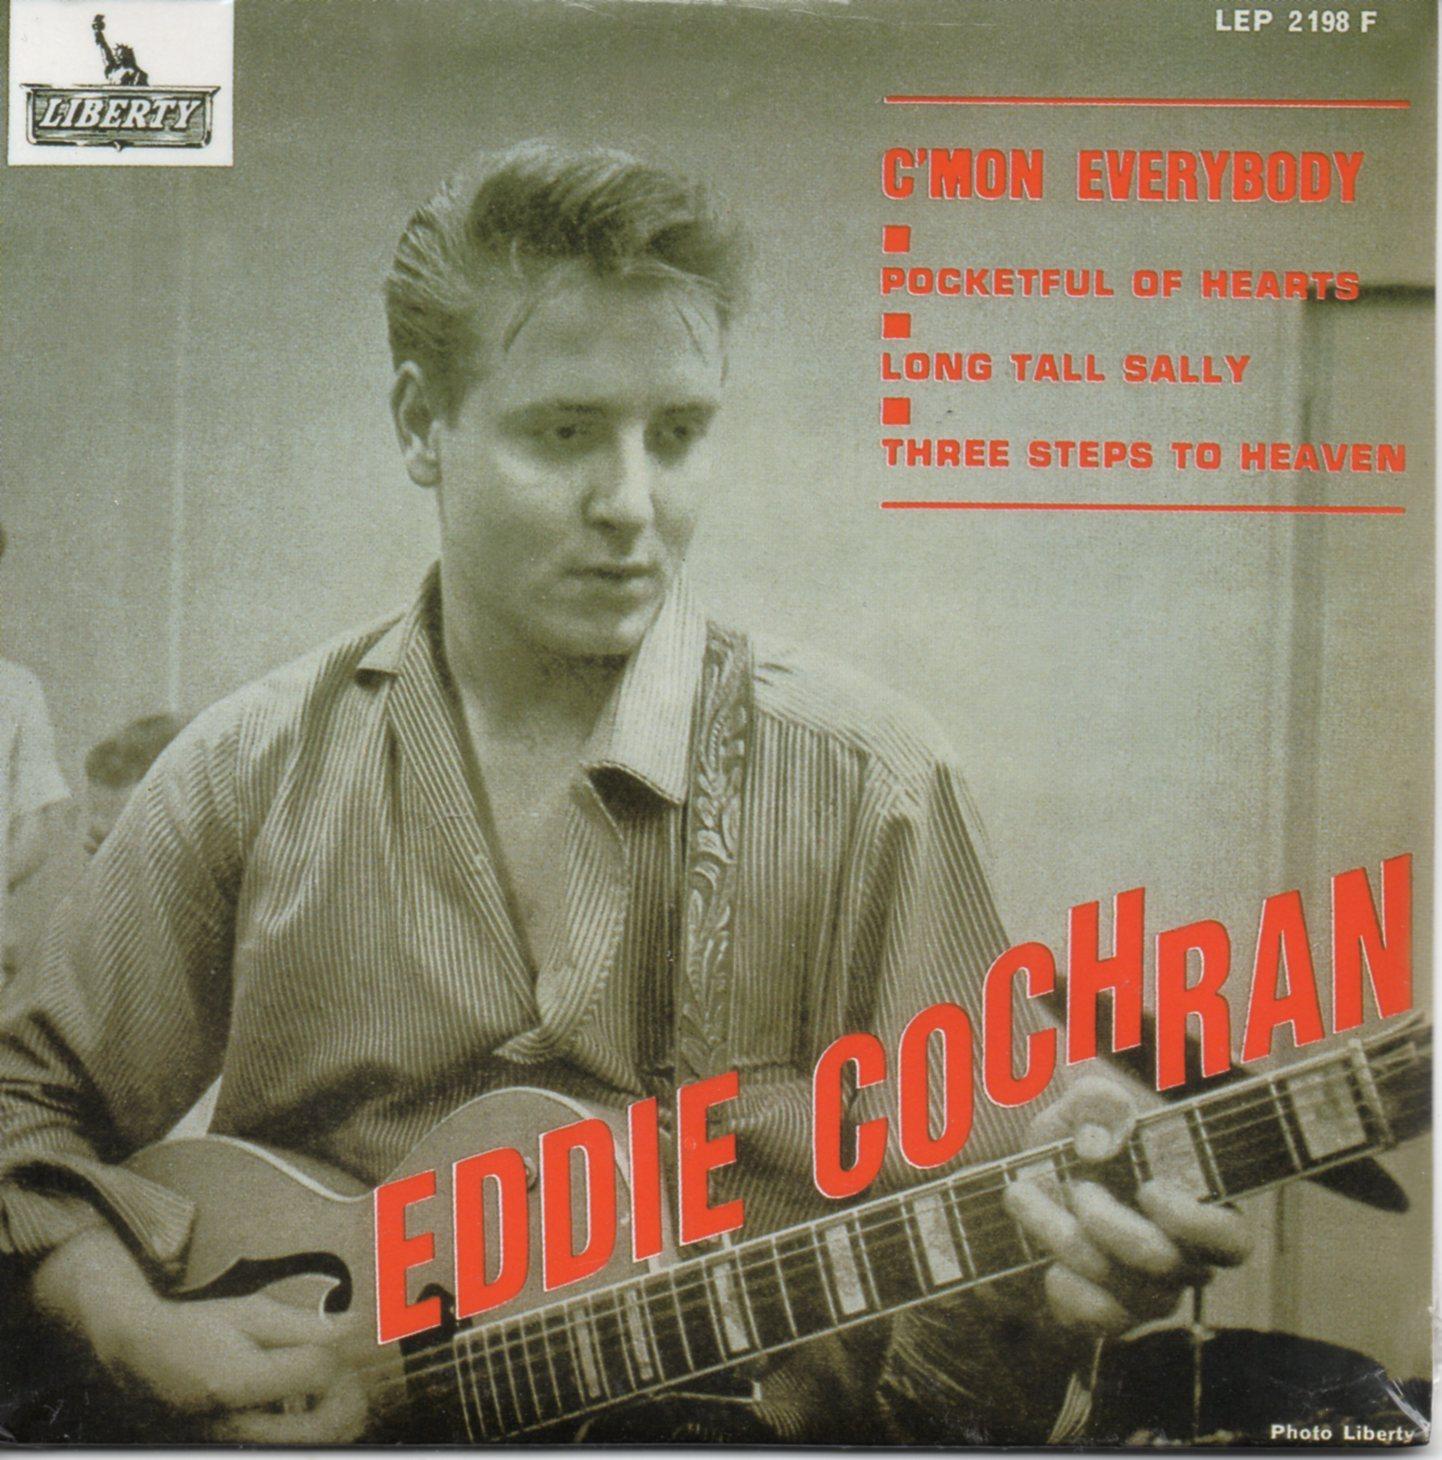 Eddie COCHRAN - C'mon Everybody 4-track Card Sleeve